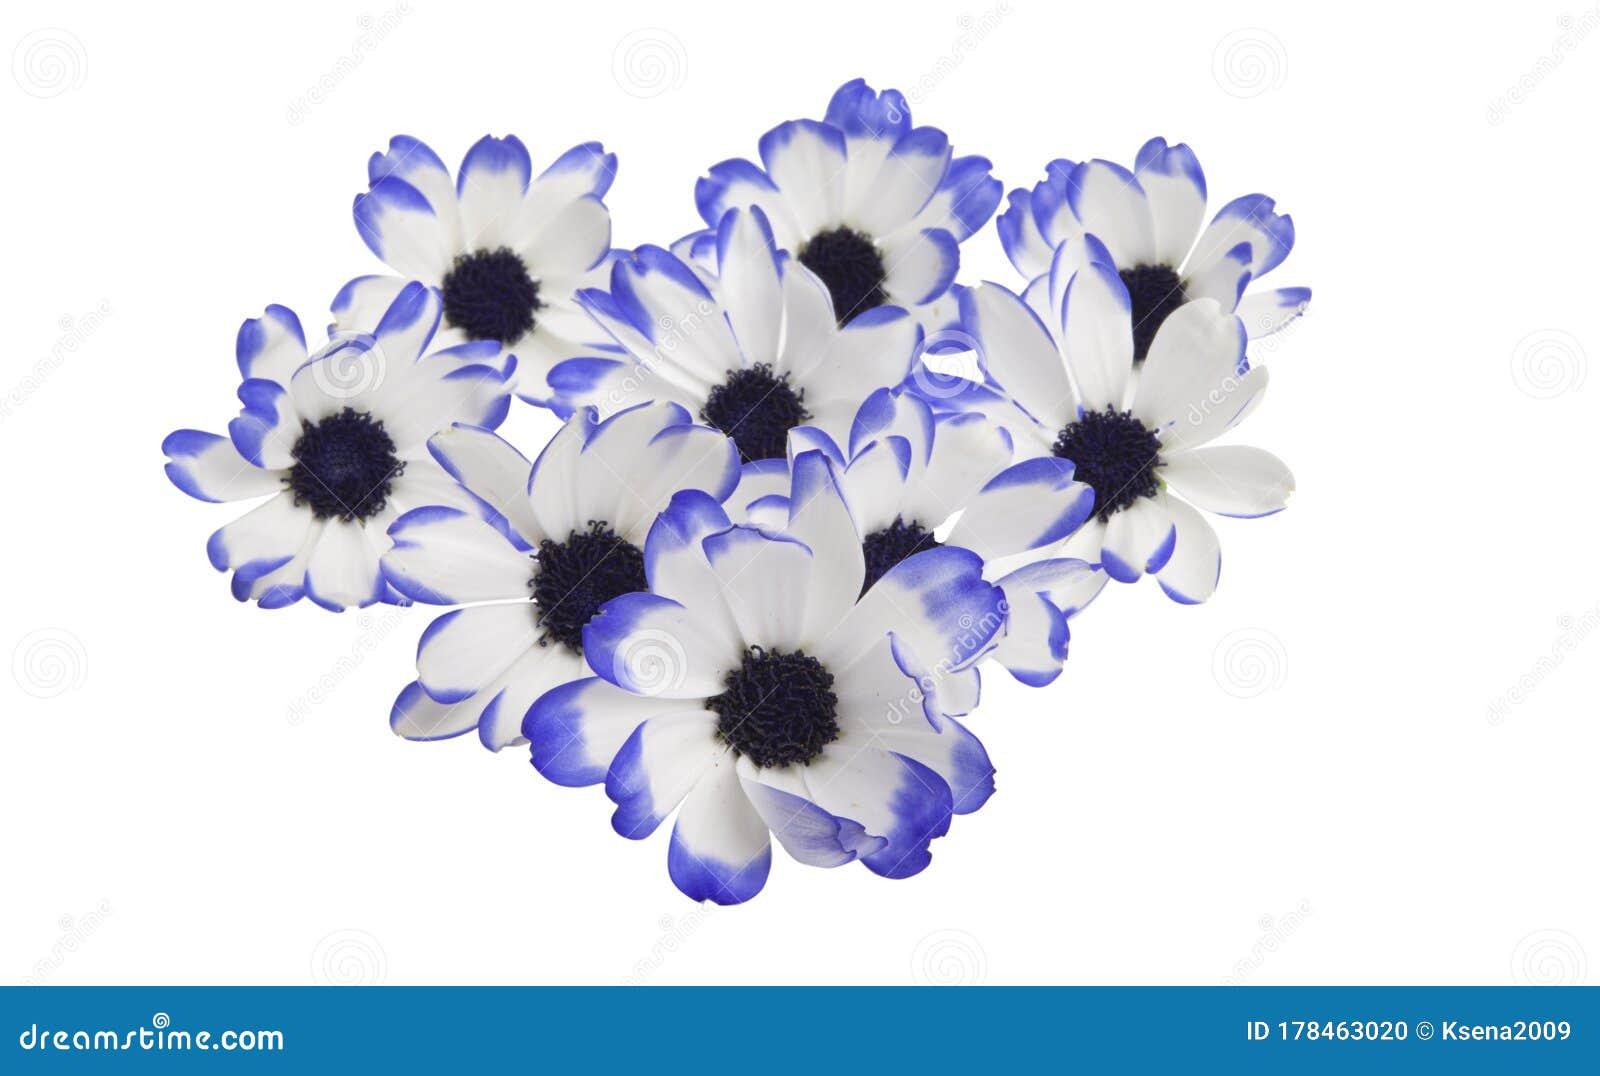 Pericallis Unusual Flower Isolated Stock Photo Image Of Plant Blue 178463020